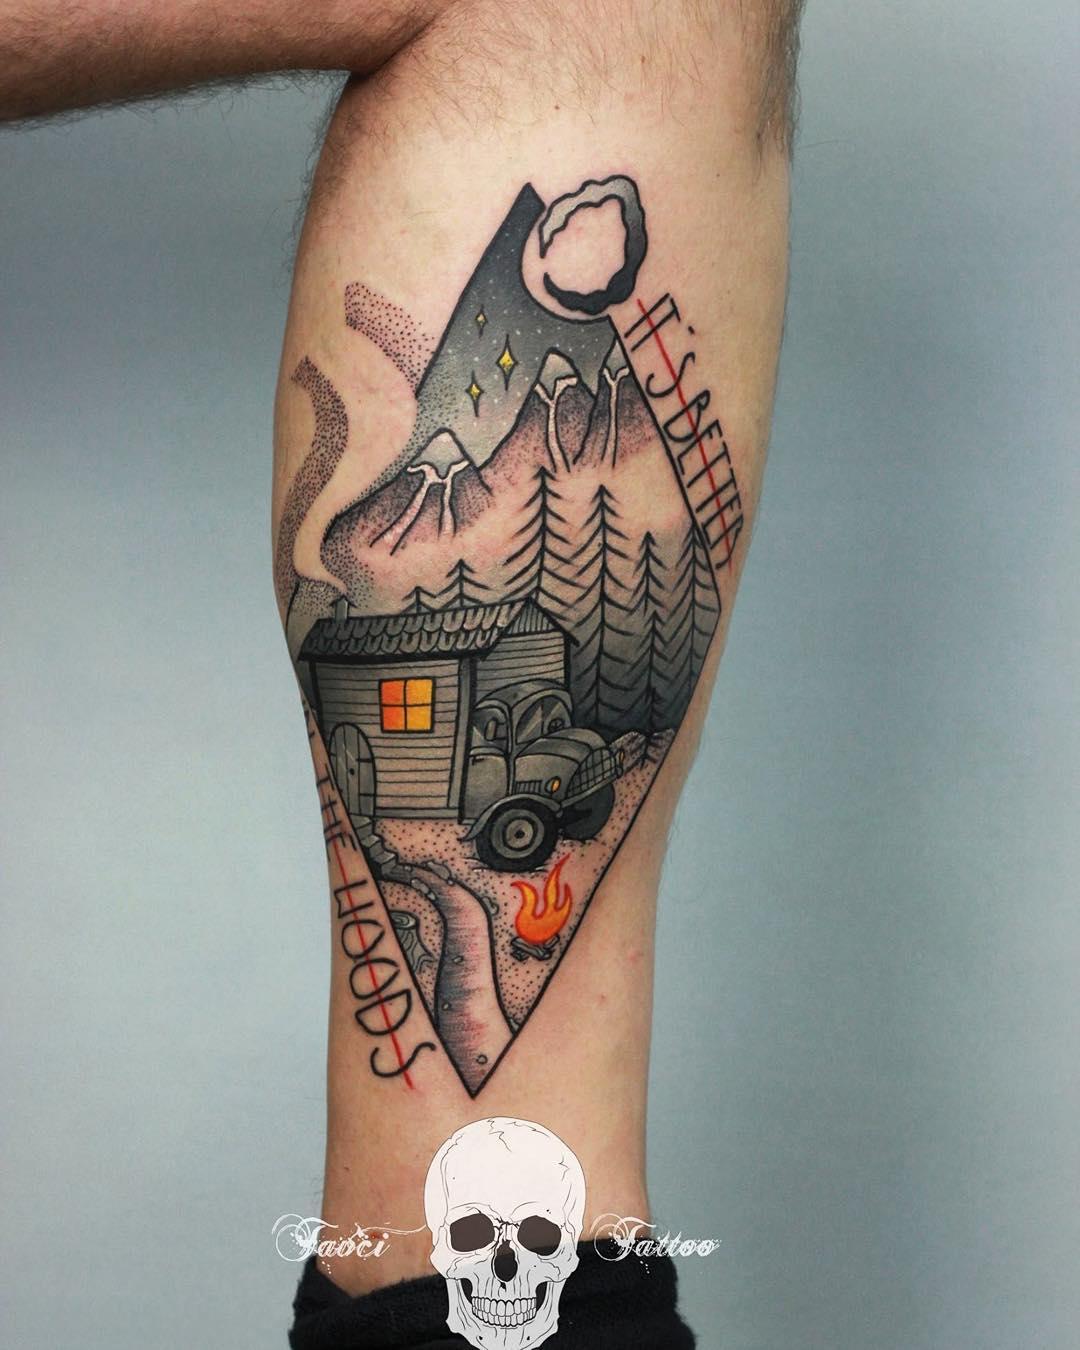 strange landscape of some hut in woods tattoo on leg